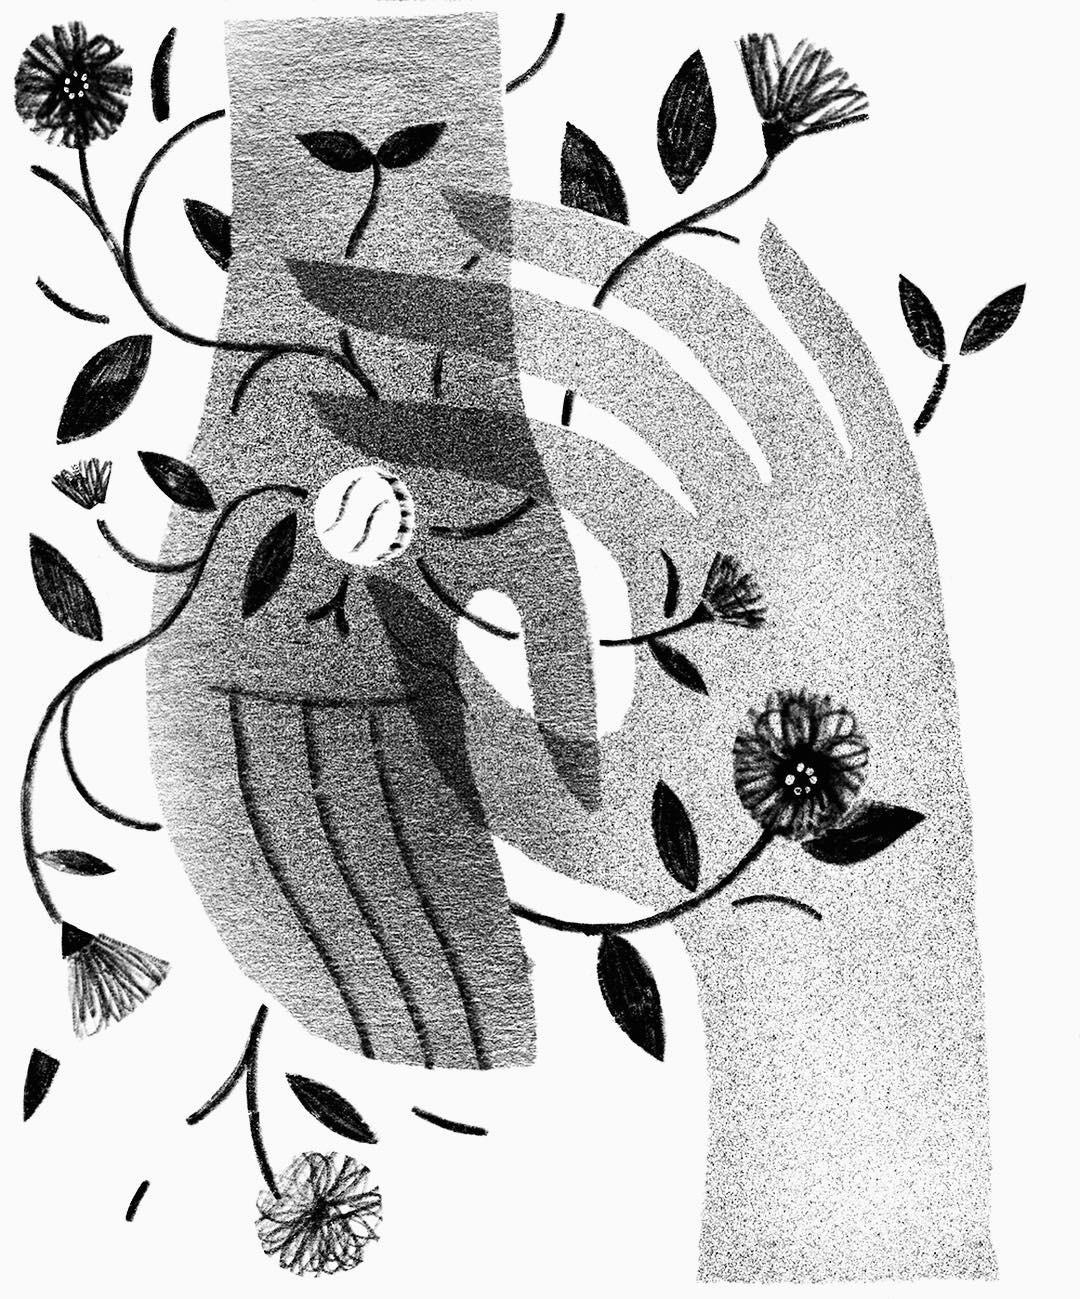 Gray illustration by Julianna Brion